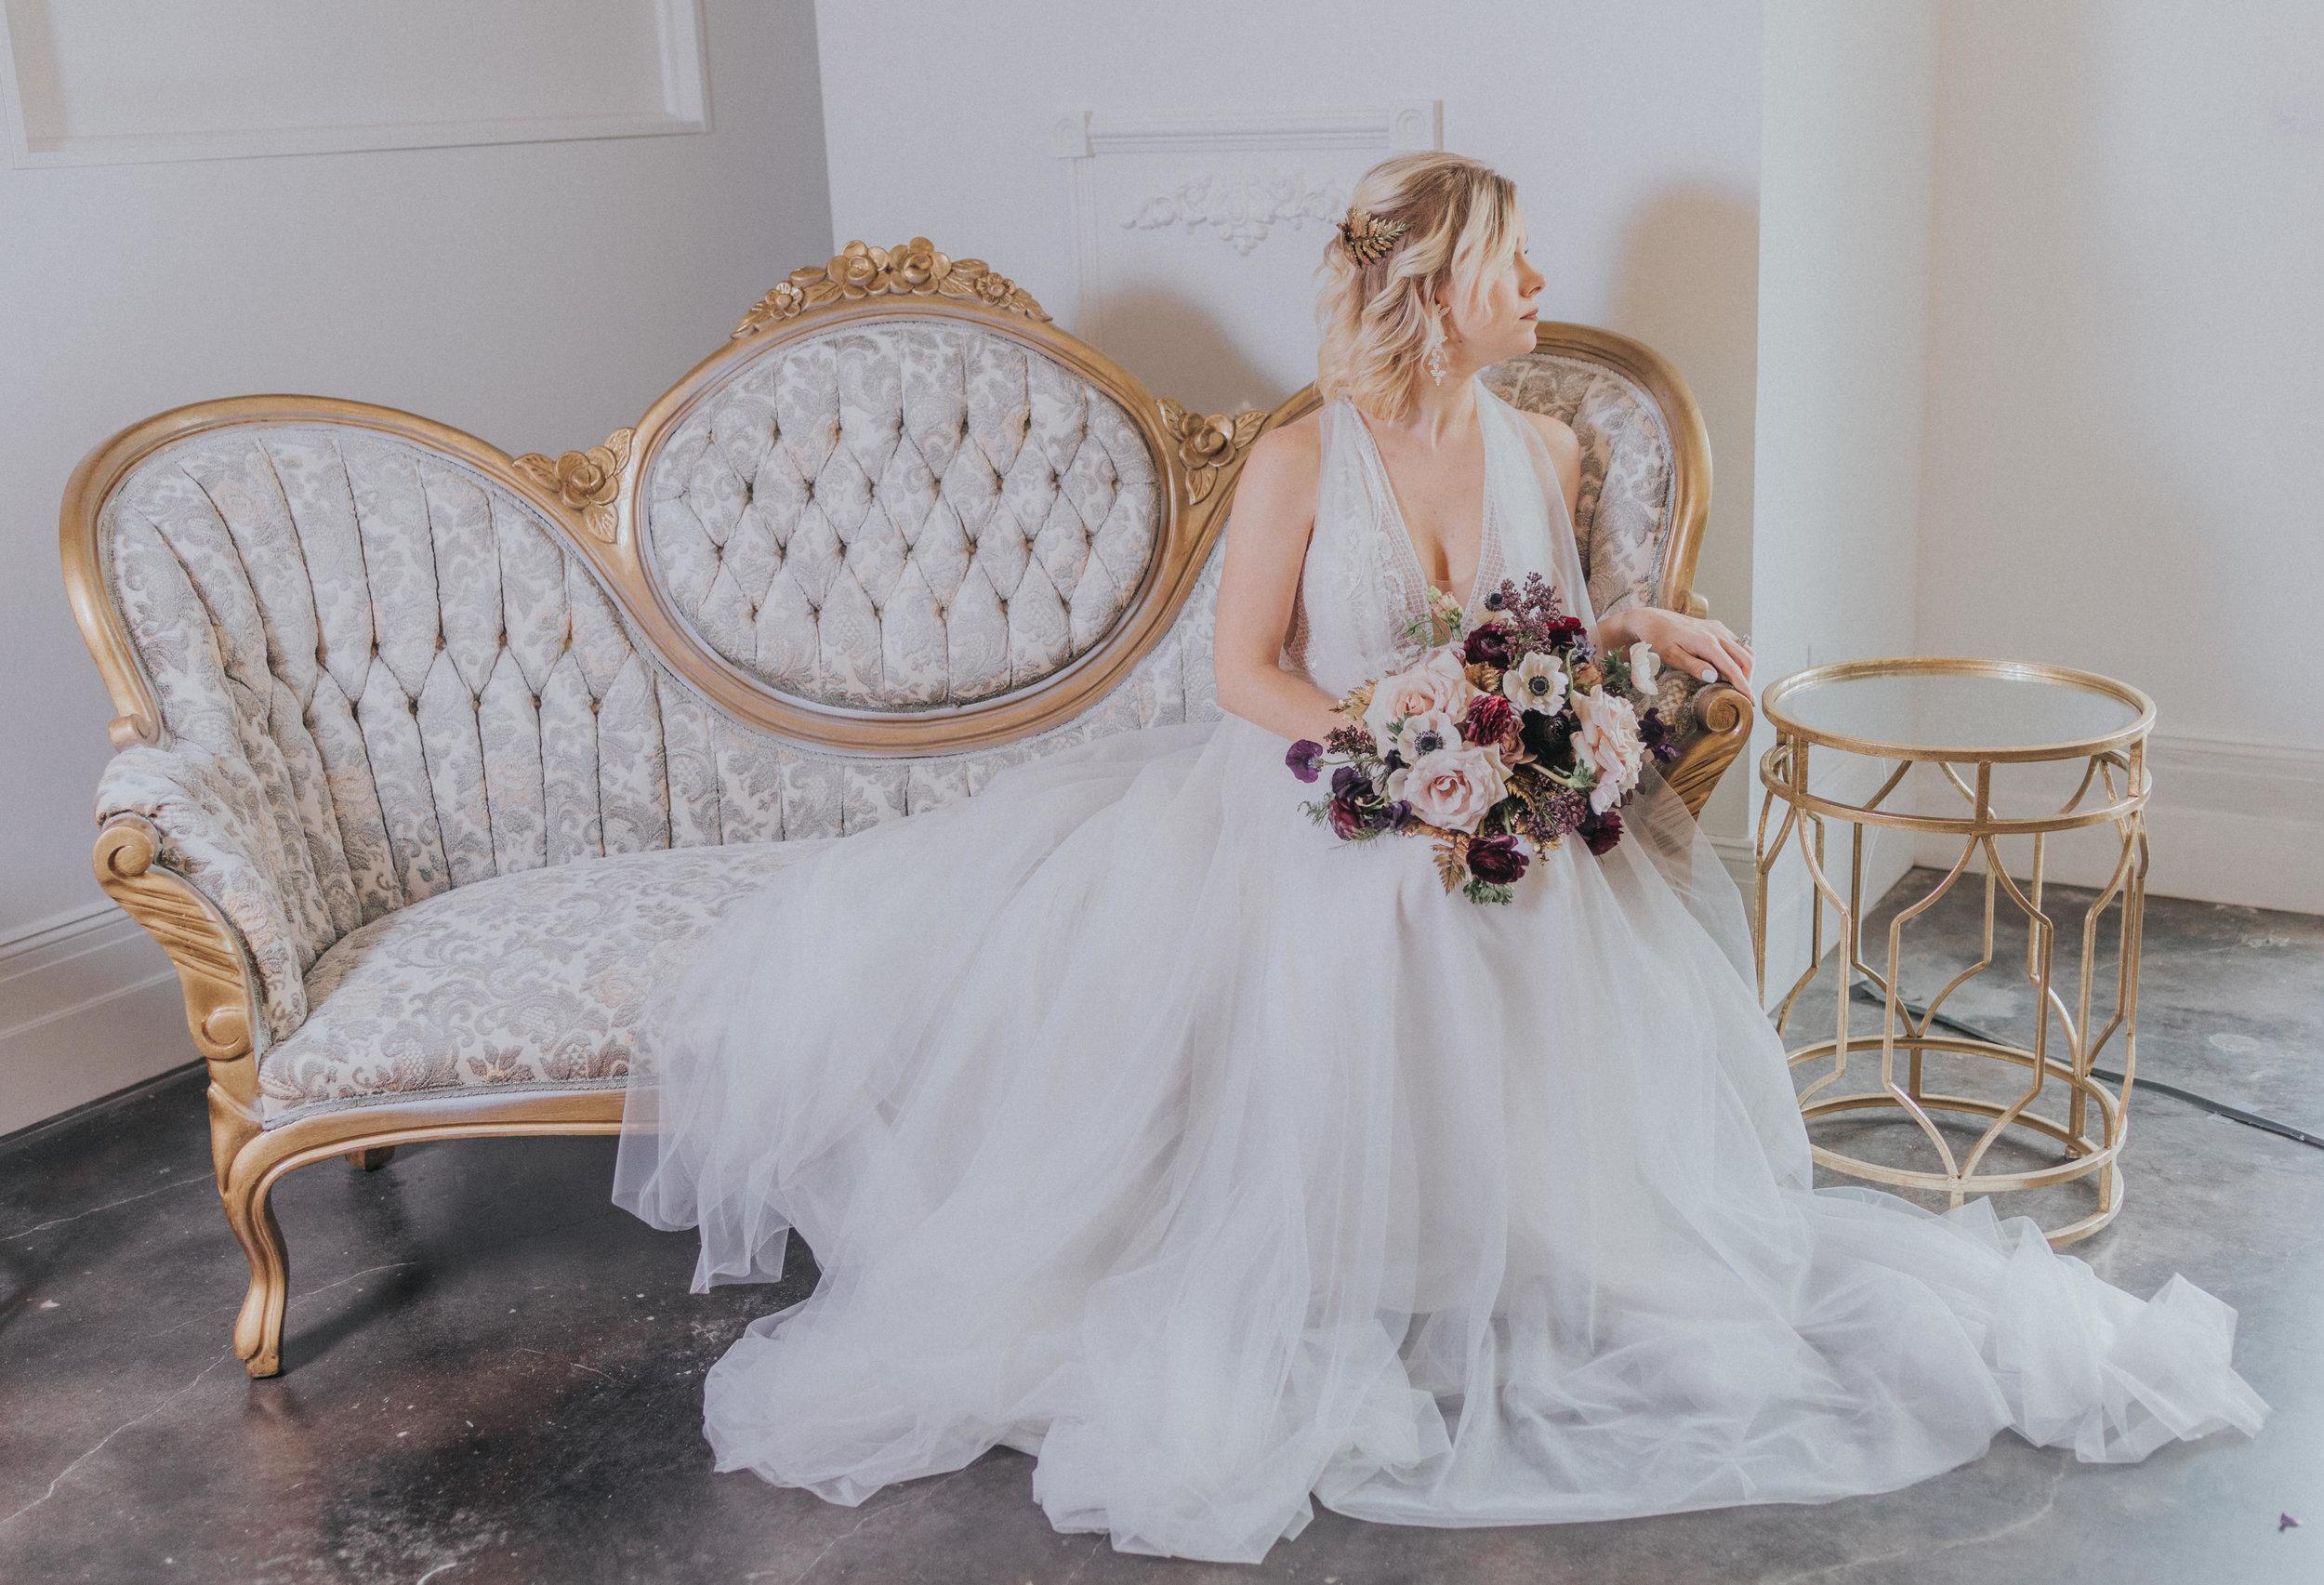 160 tiny-luxe-weddings-omaha-nebraska-midwest-empire-room.jpg